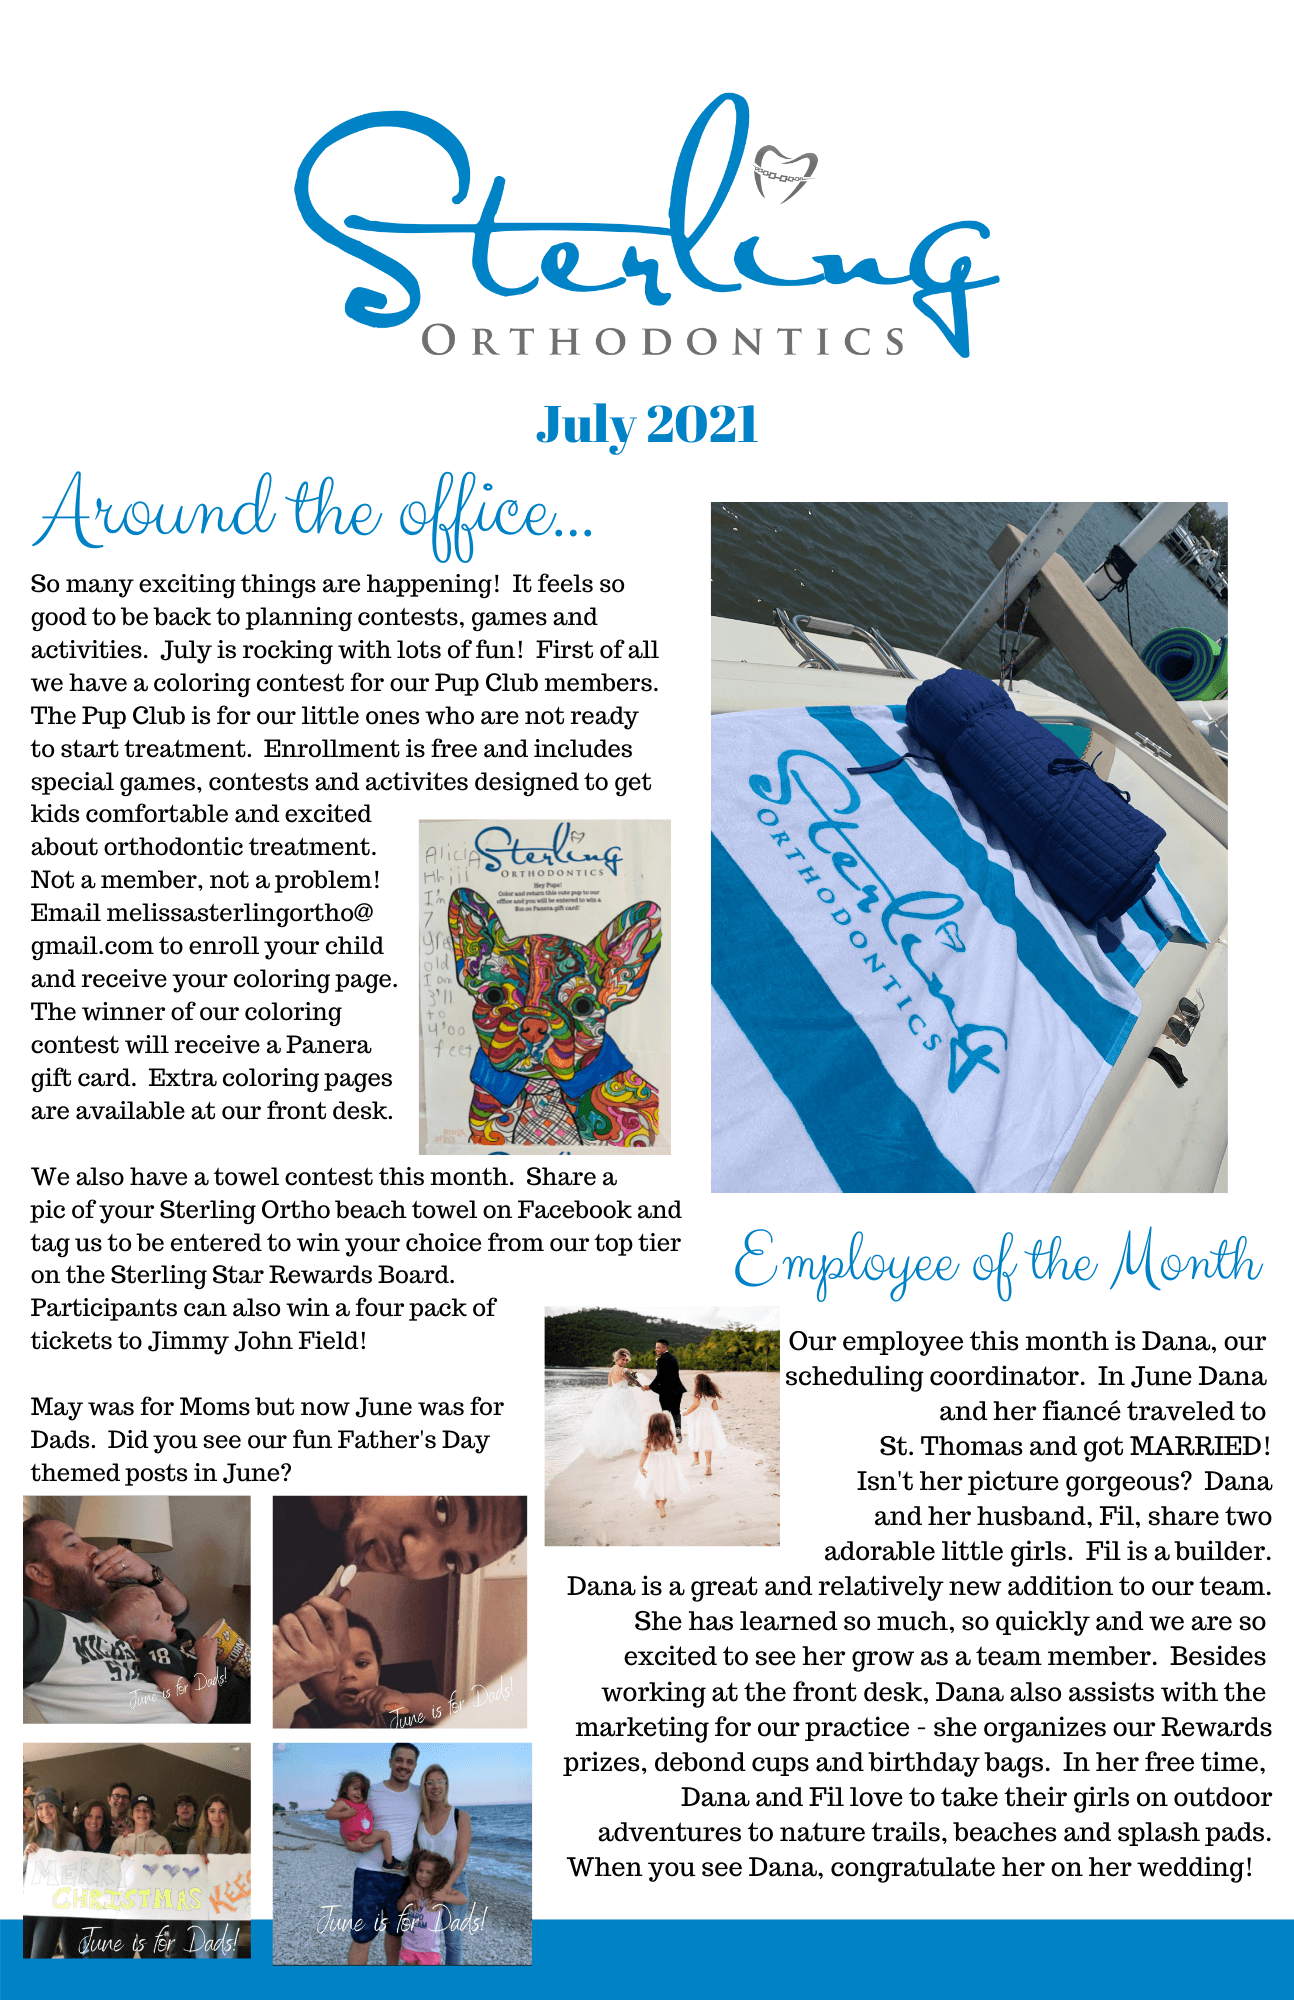 July 2021 blog post